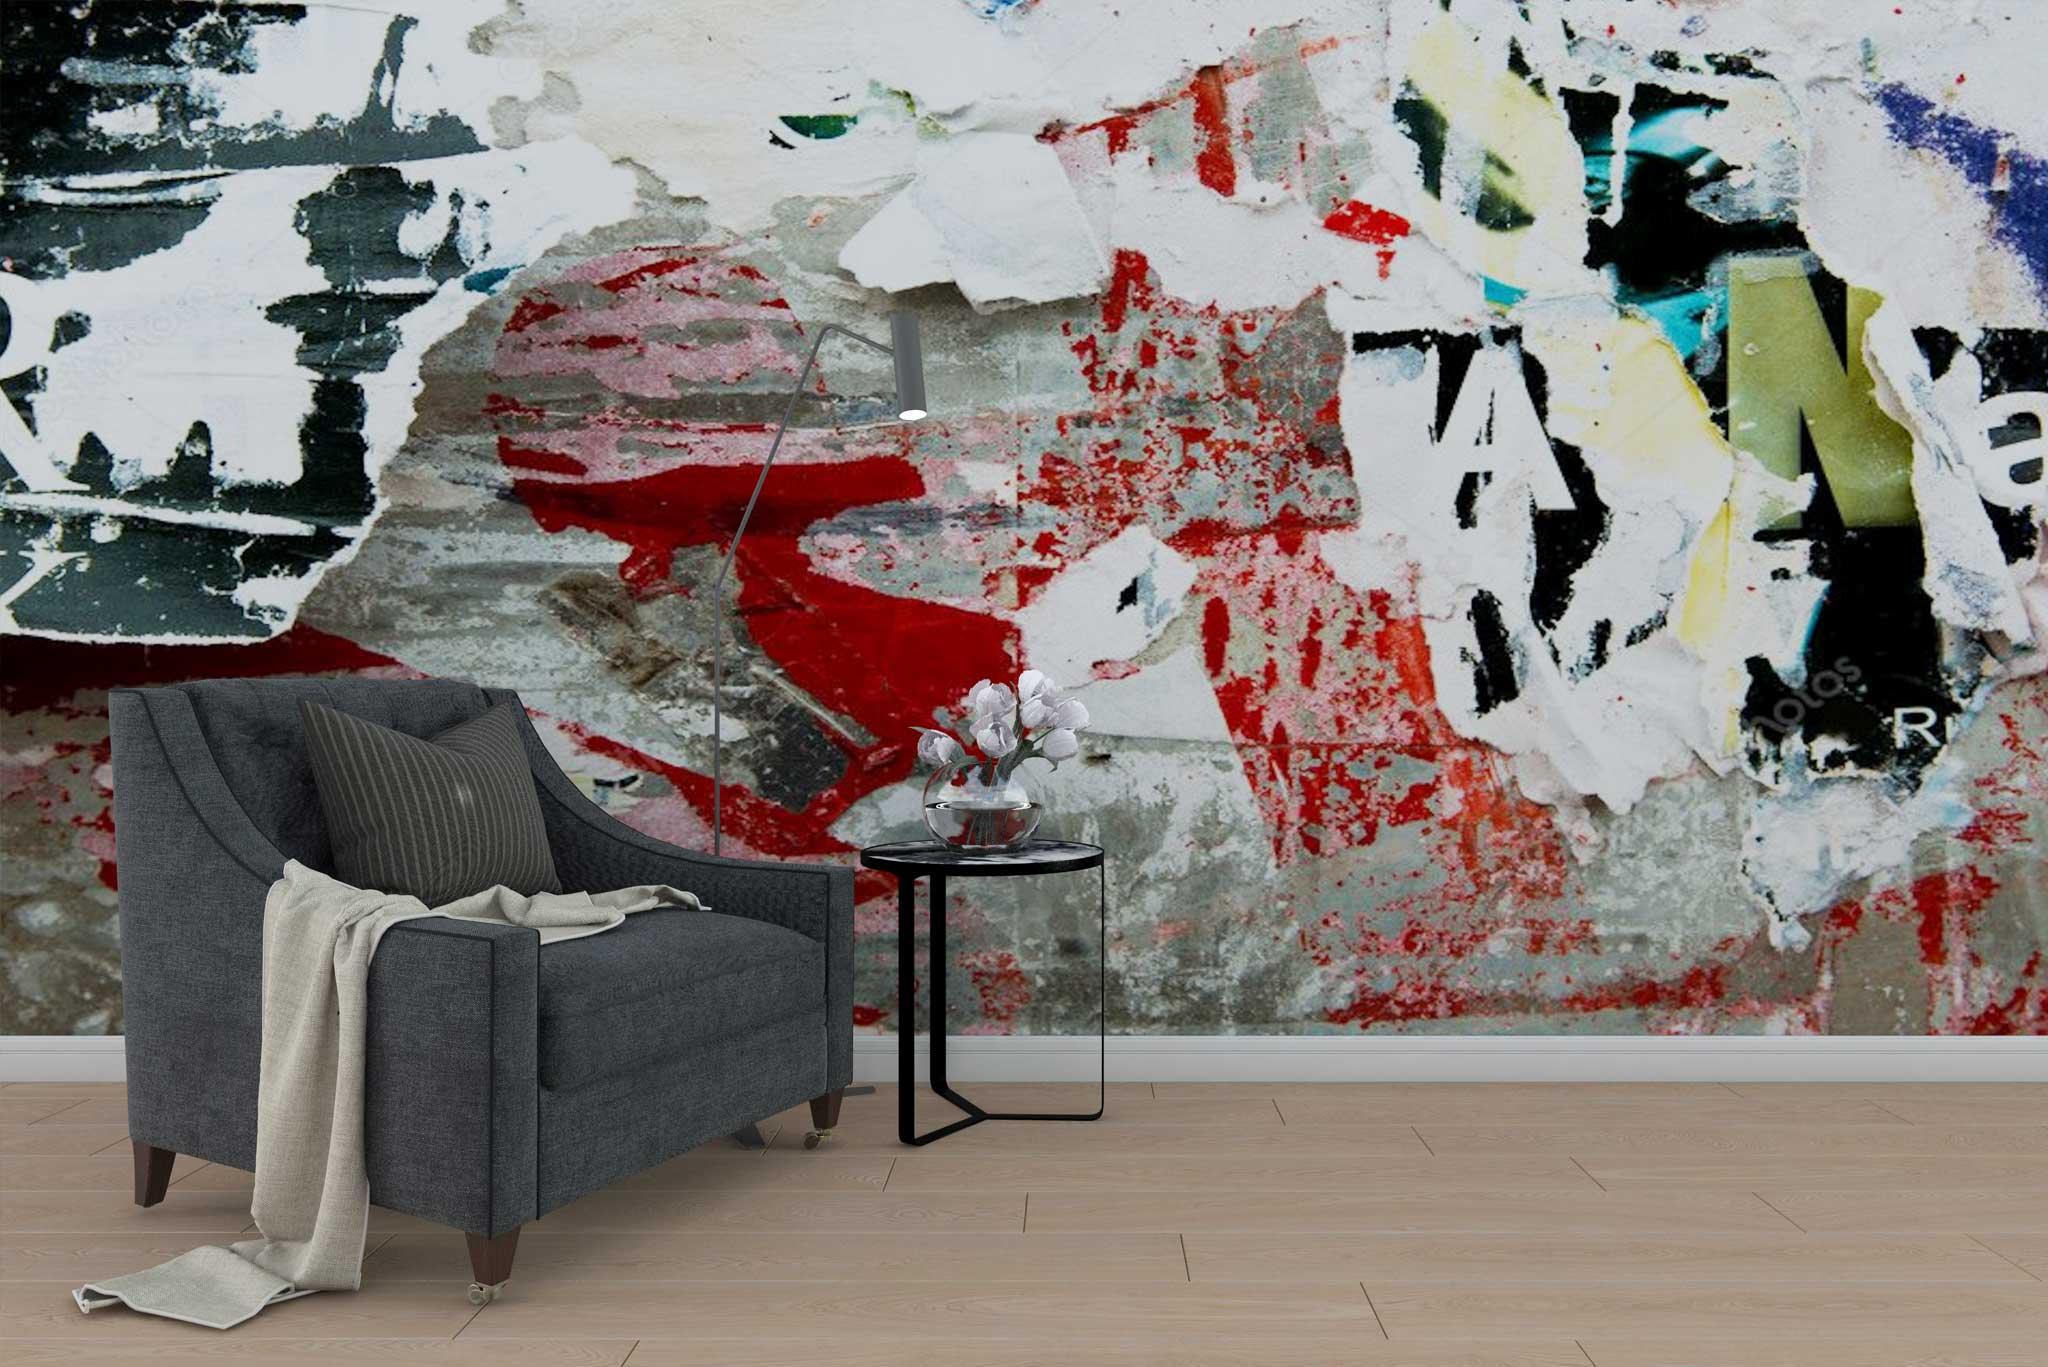 tapet-fototapet-special-personalizat-customizabil-comanda-bucuresti-daring-prints-model-afise-rupte-industrial-grunge-multicolor-negru-rosu